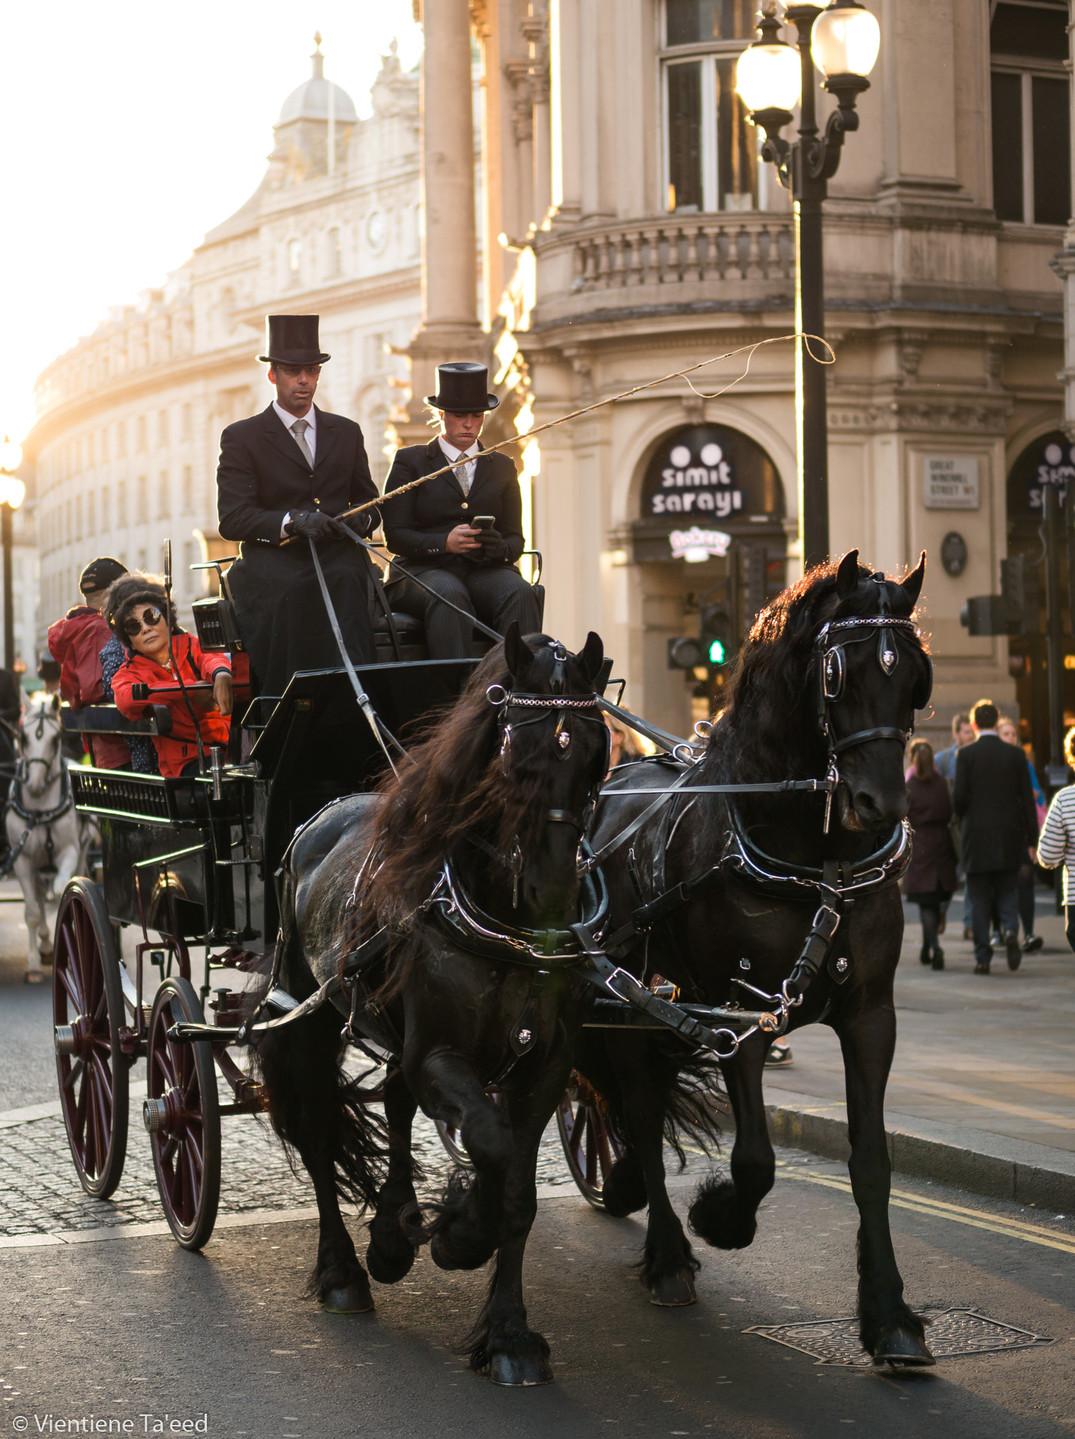 1850s London